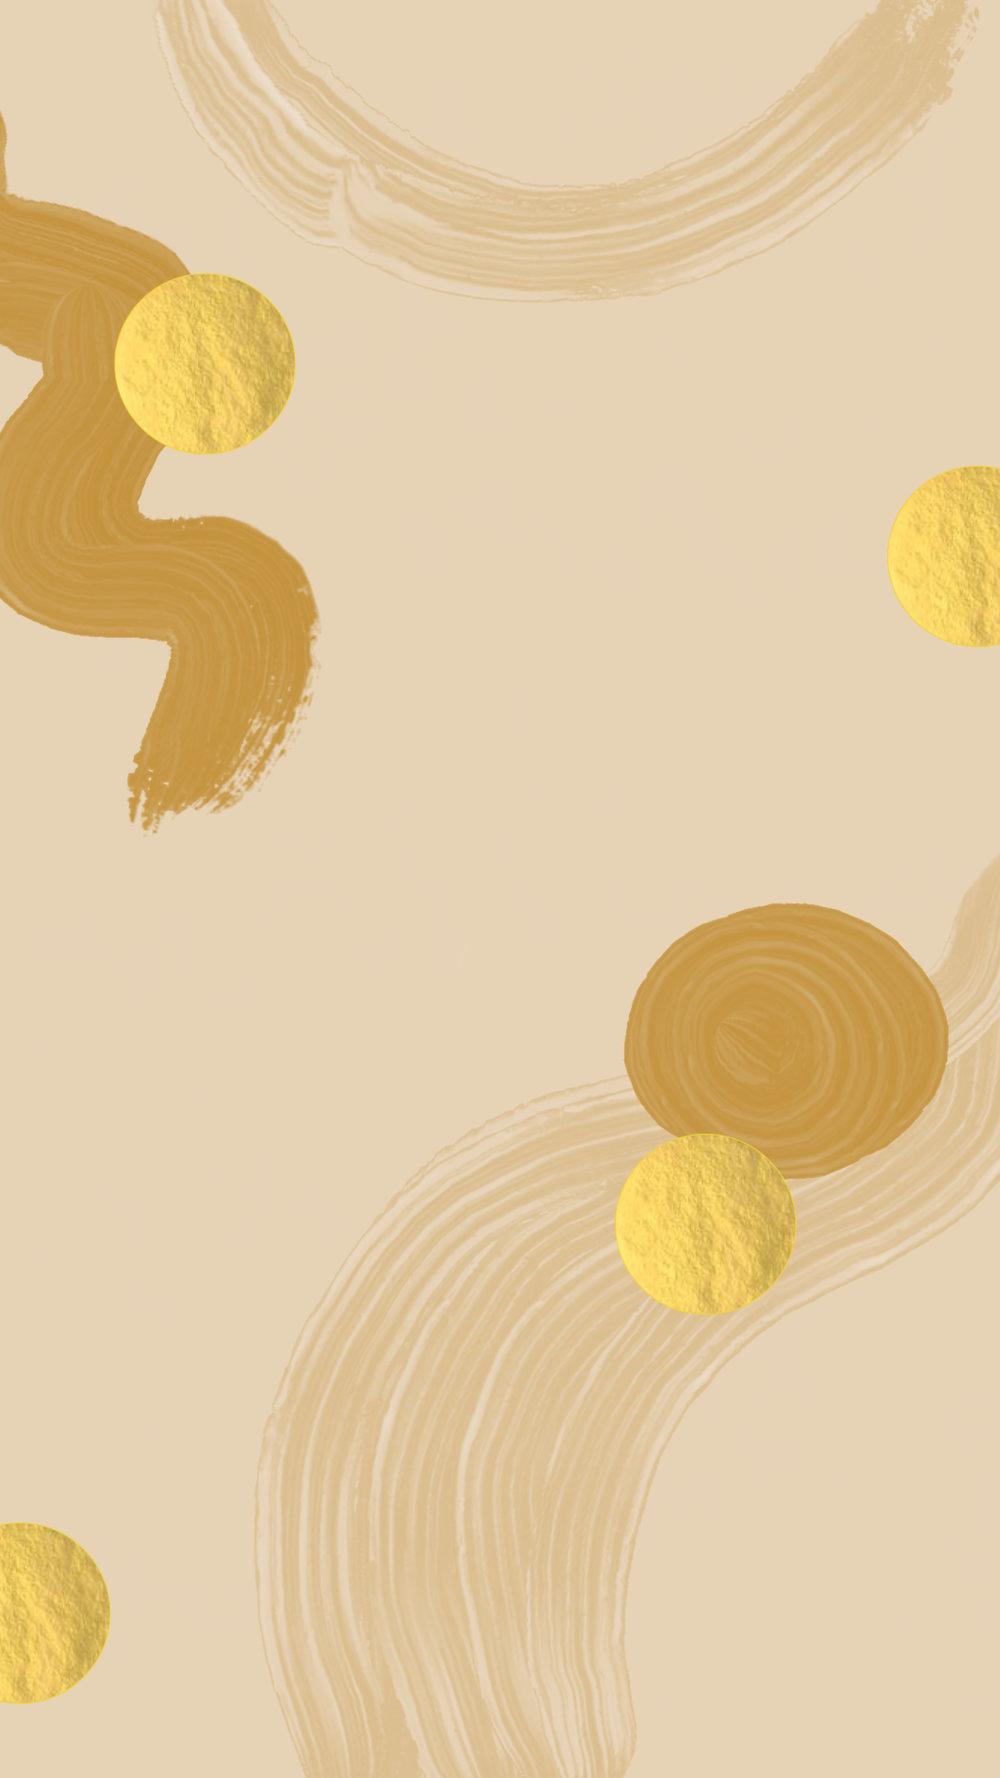 Insta-story-backgrounds2.jpg